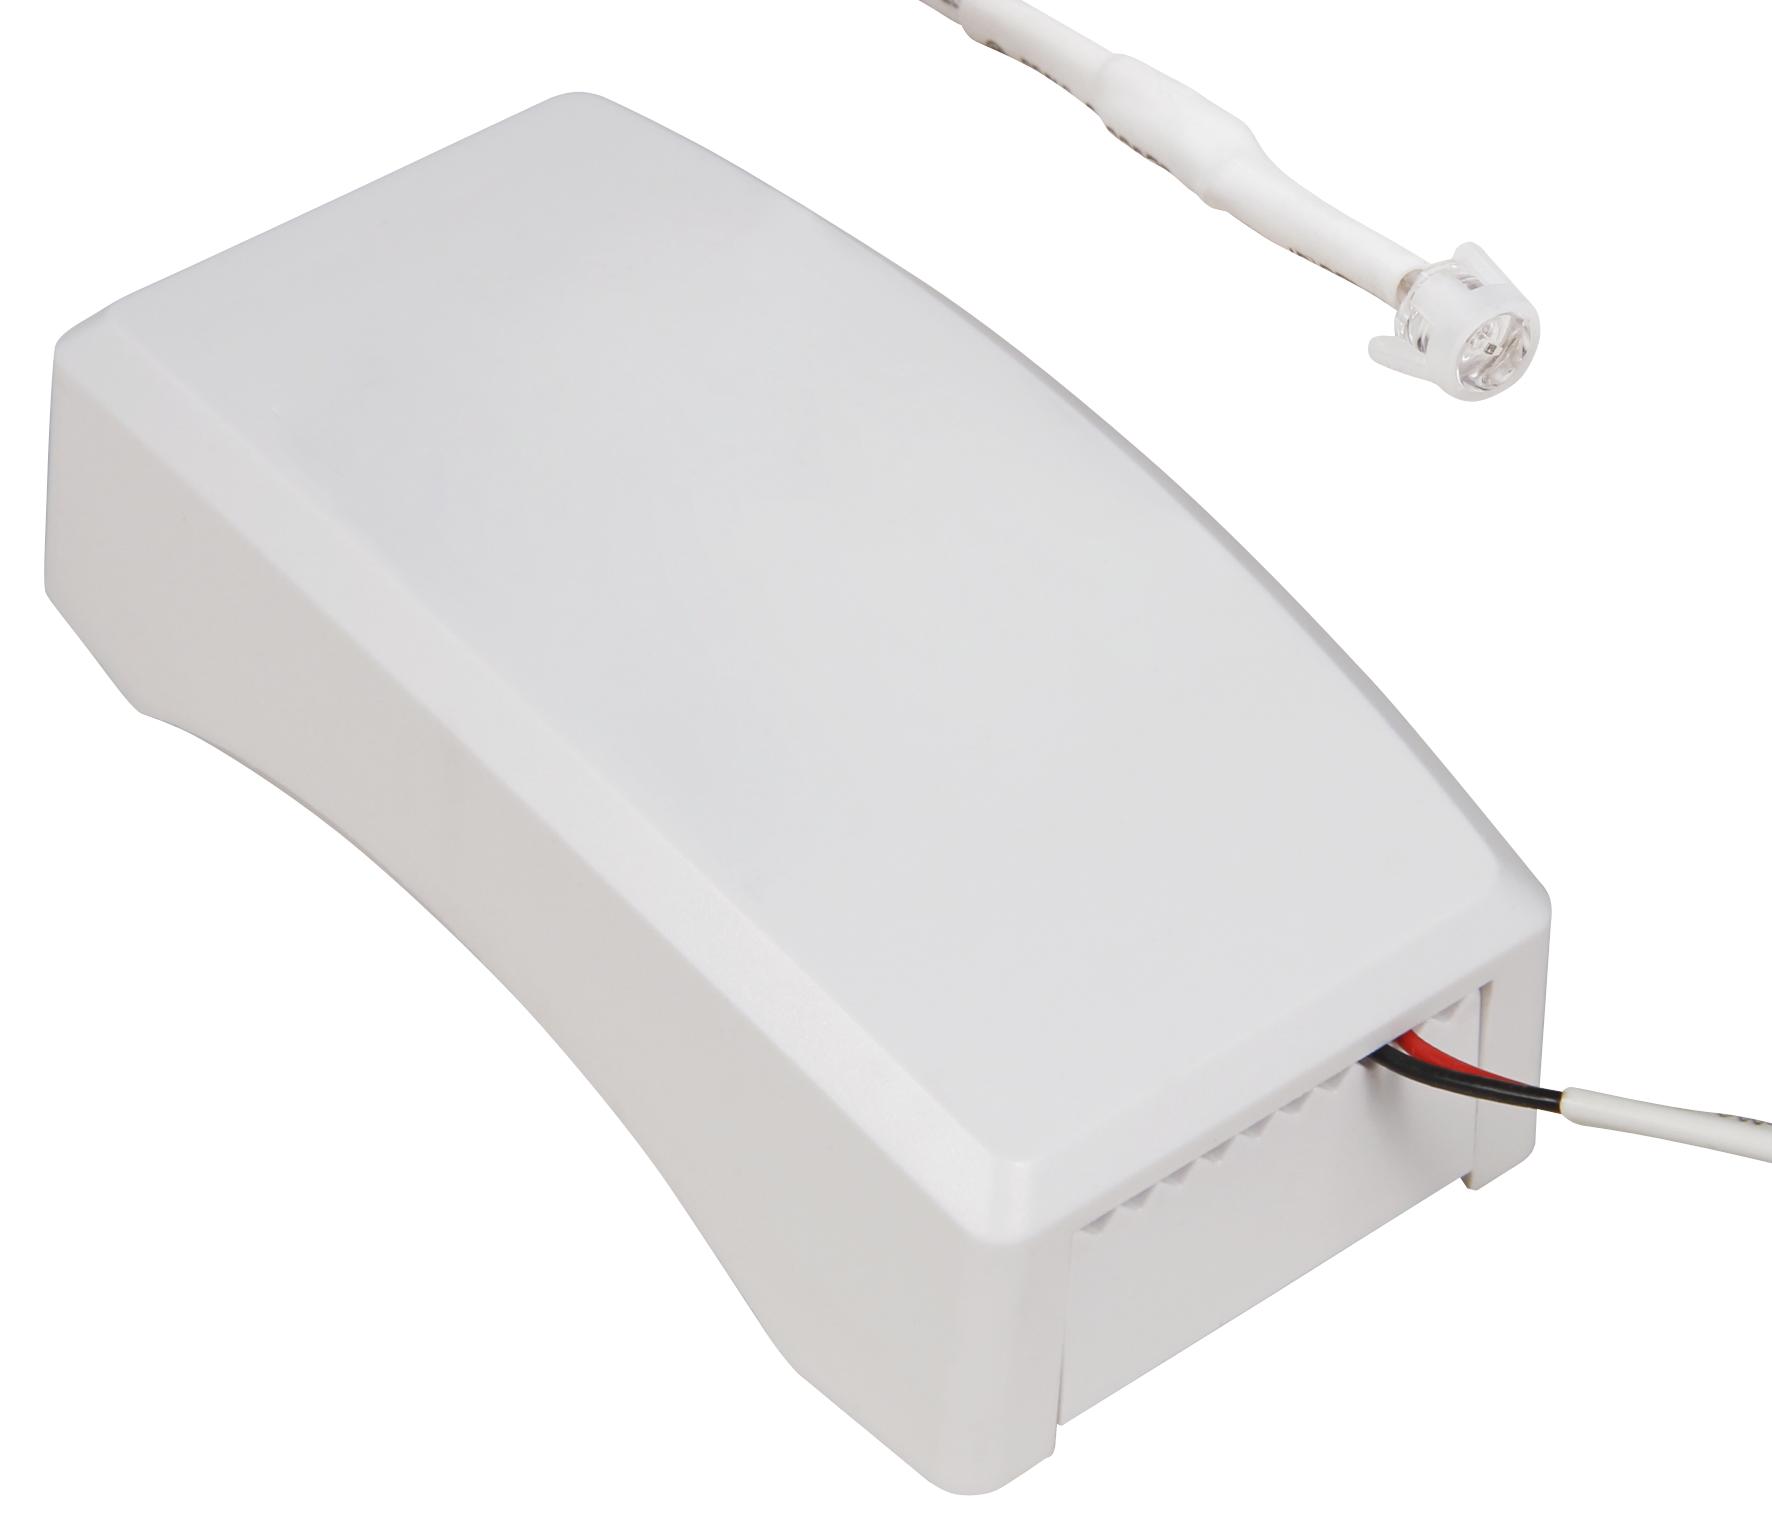 HF / Mikrowellen Einbau-Bewegungsmelder McShine ''LX-653'', 360°, 1200W, LED geeignet